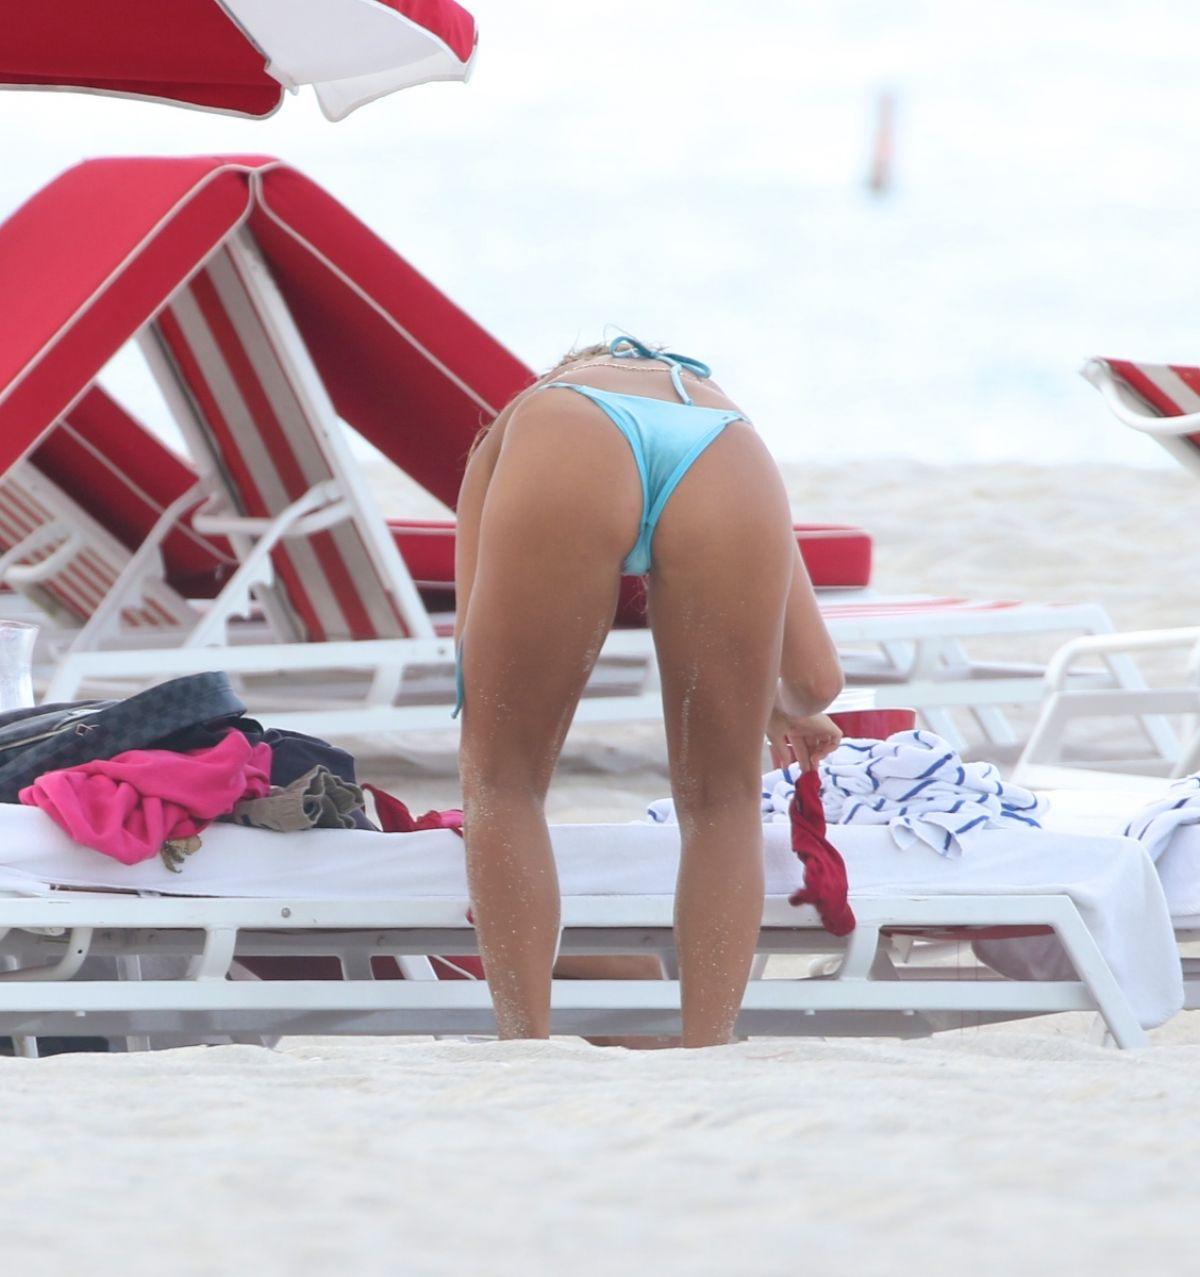 Bikini Sarah Kohan nudes (92 photos), Sexy, Sideboobs, Feet, cleavage 2006